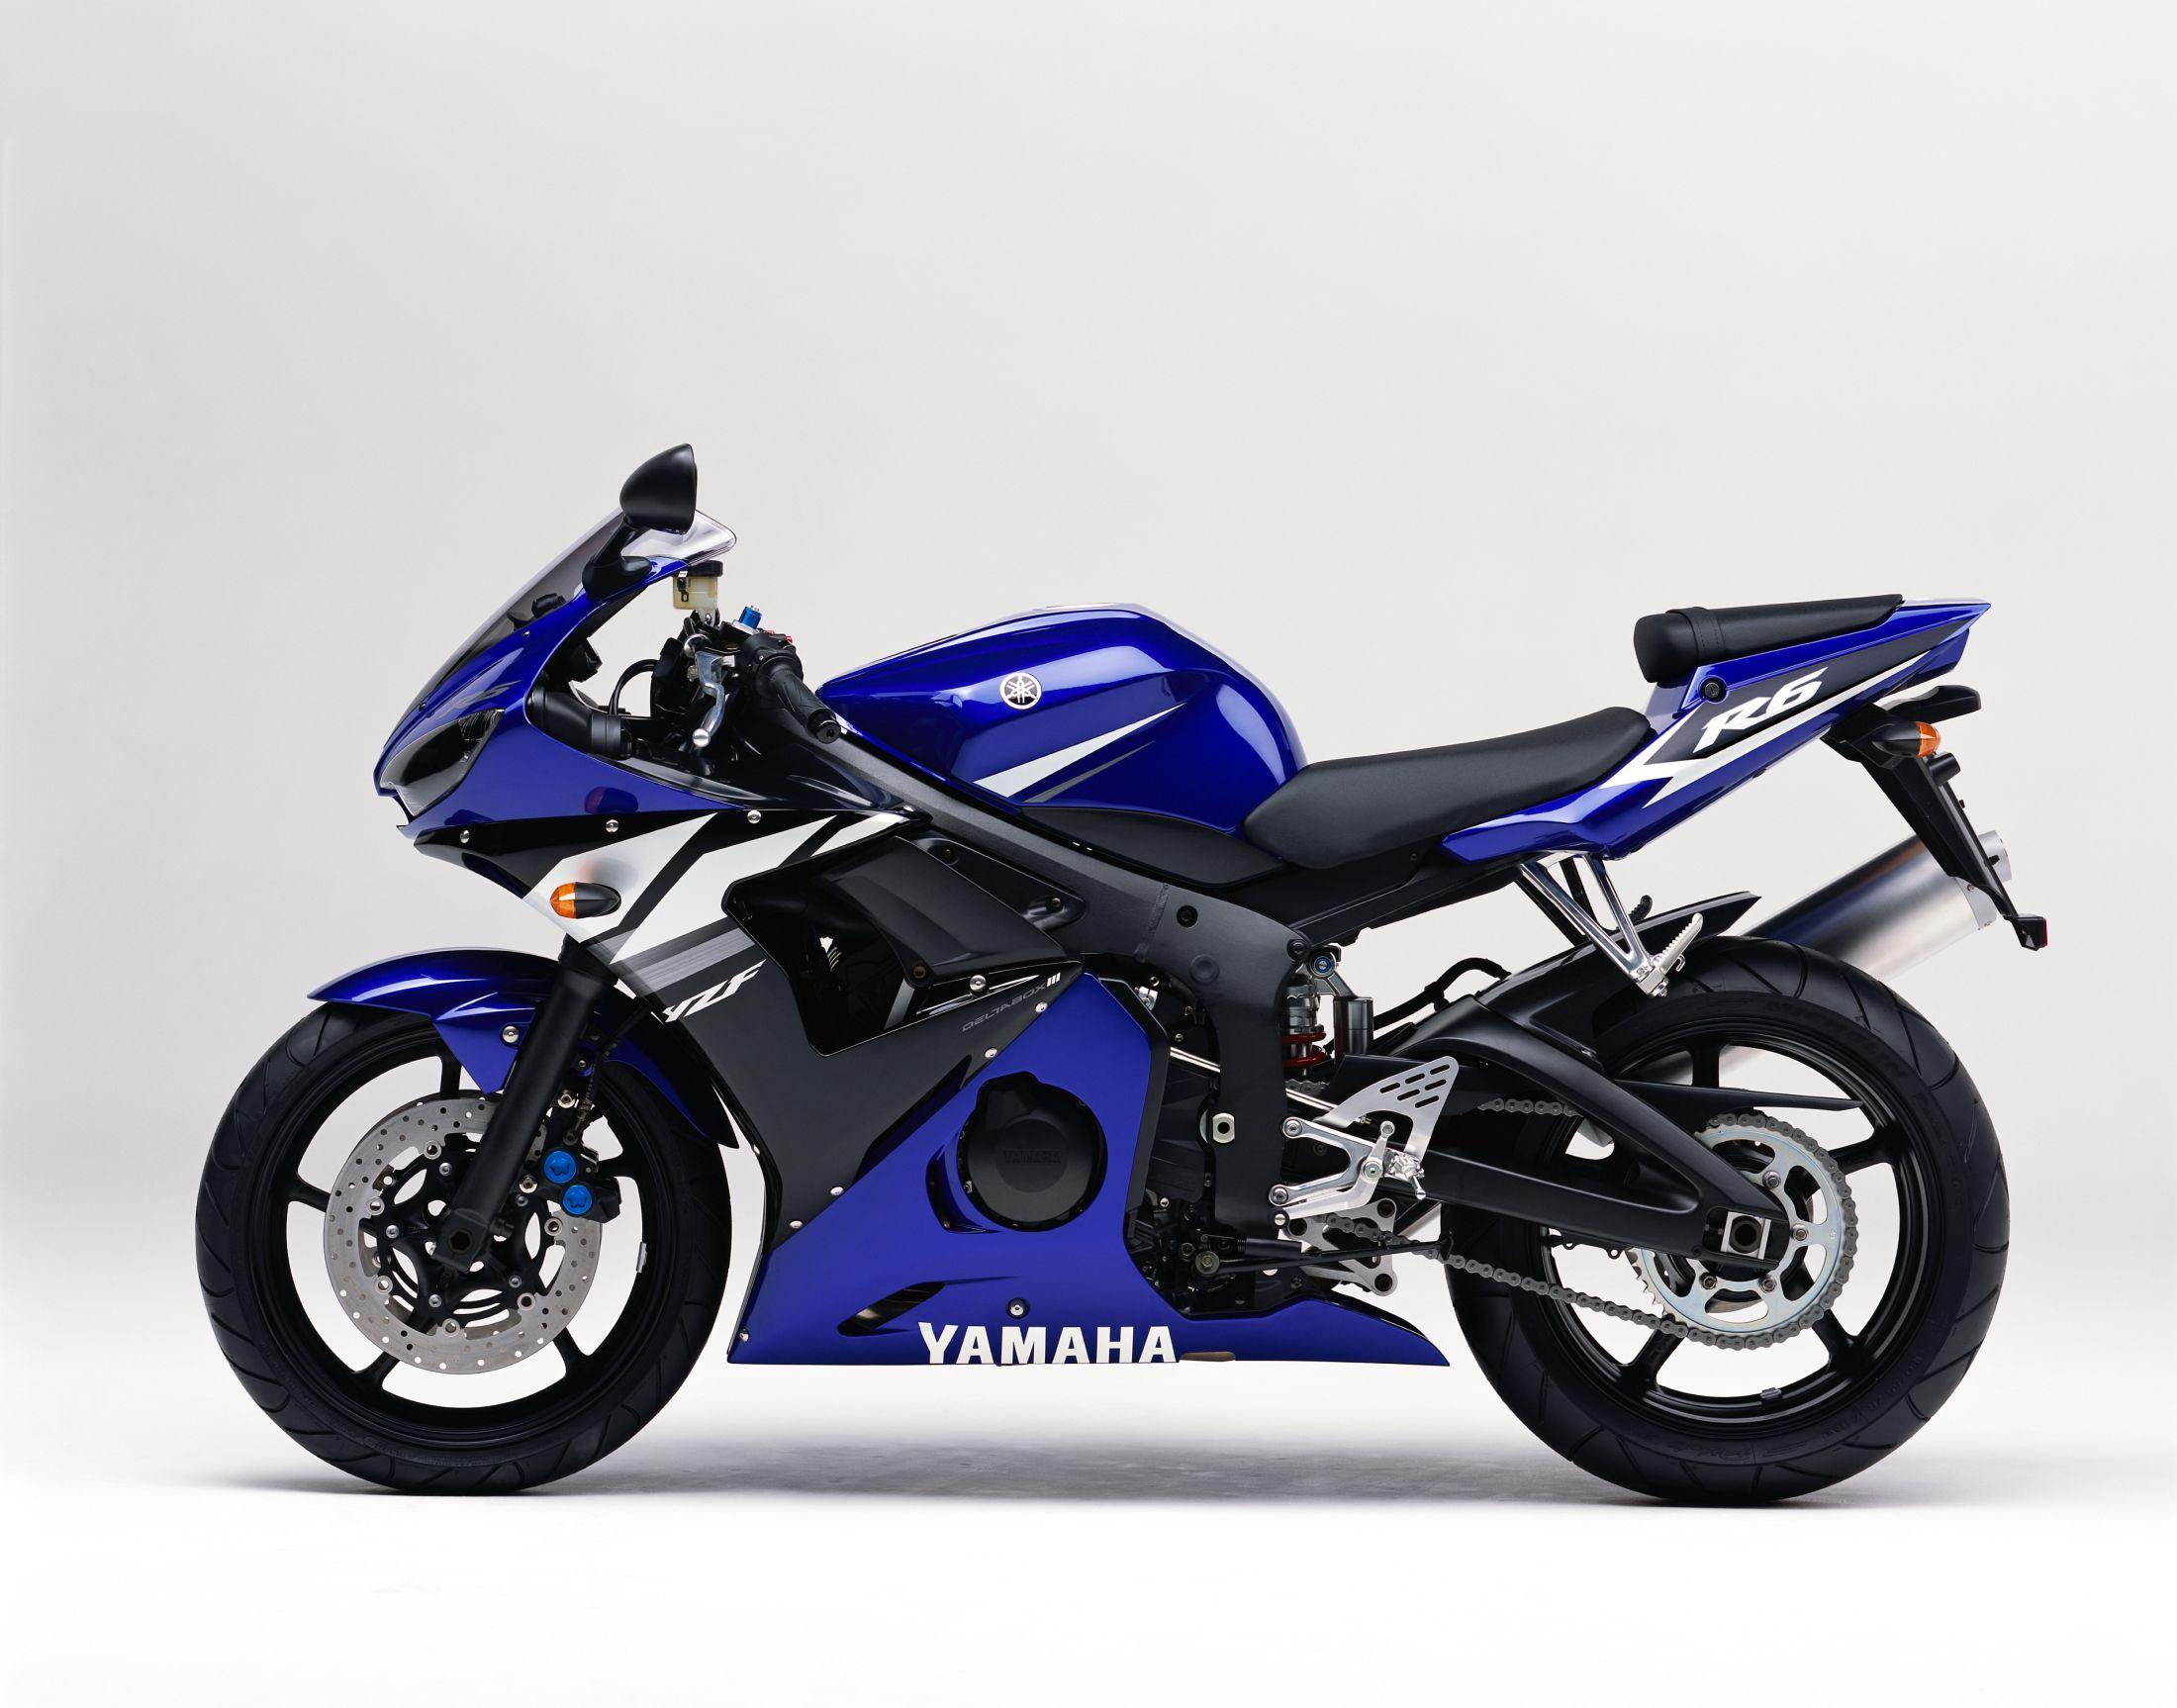 Yamaha supersport yamaha design cafe english r6 2003 for 02 yamaha r6